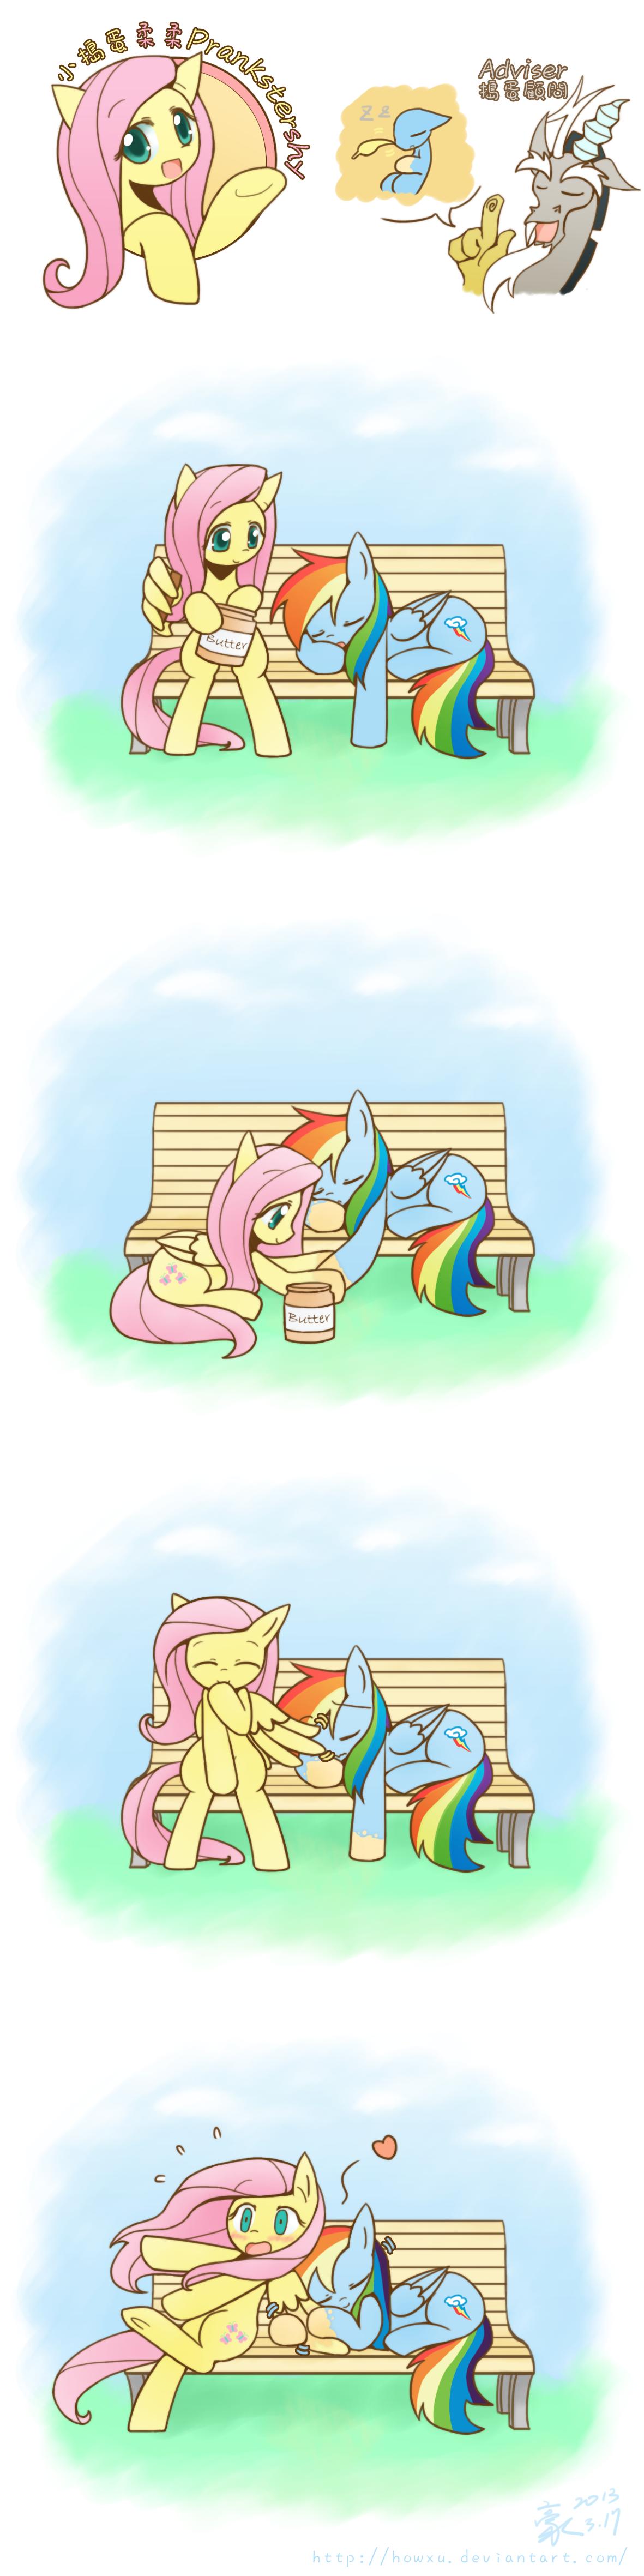 PranksterShy RainbowDash by HowXu